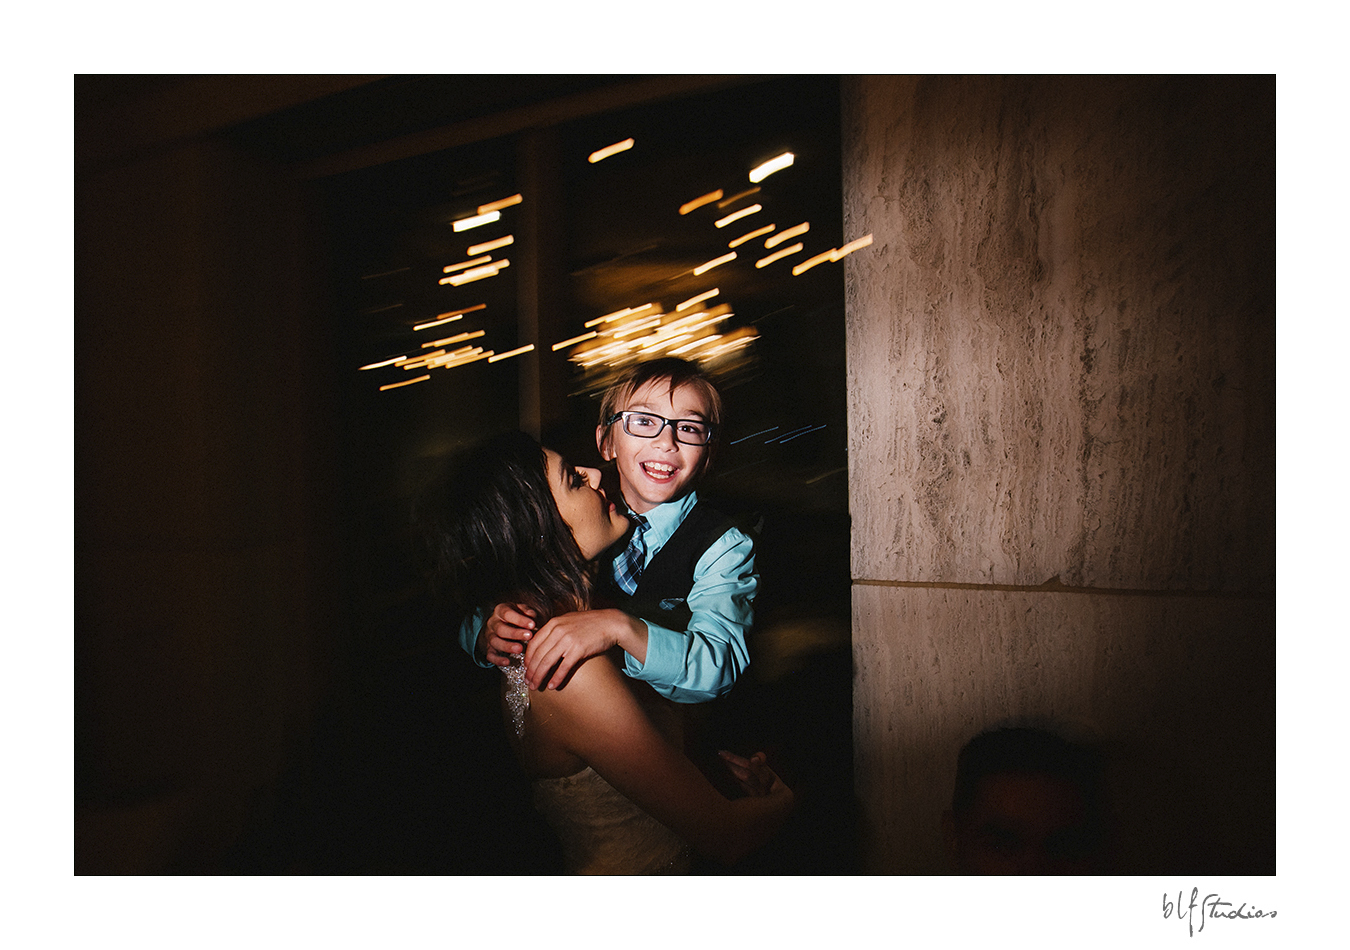 0045-blfstudios-wedding-photographer-daniel-danielle-atlanta.jpg